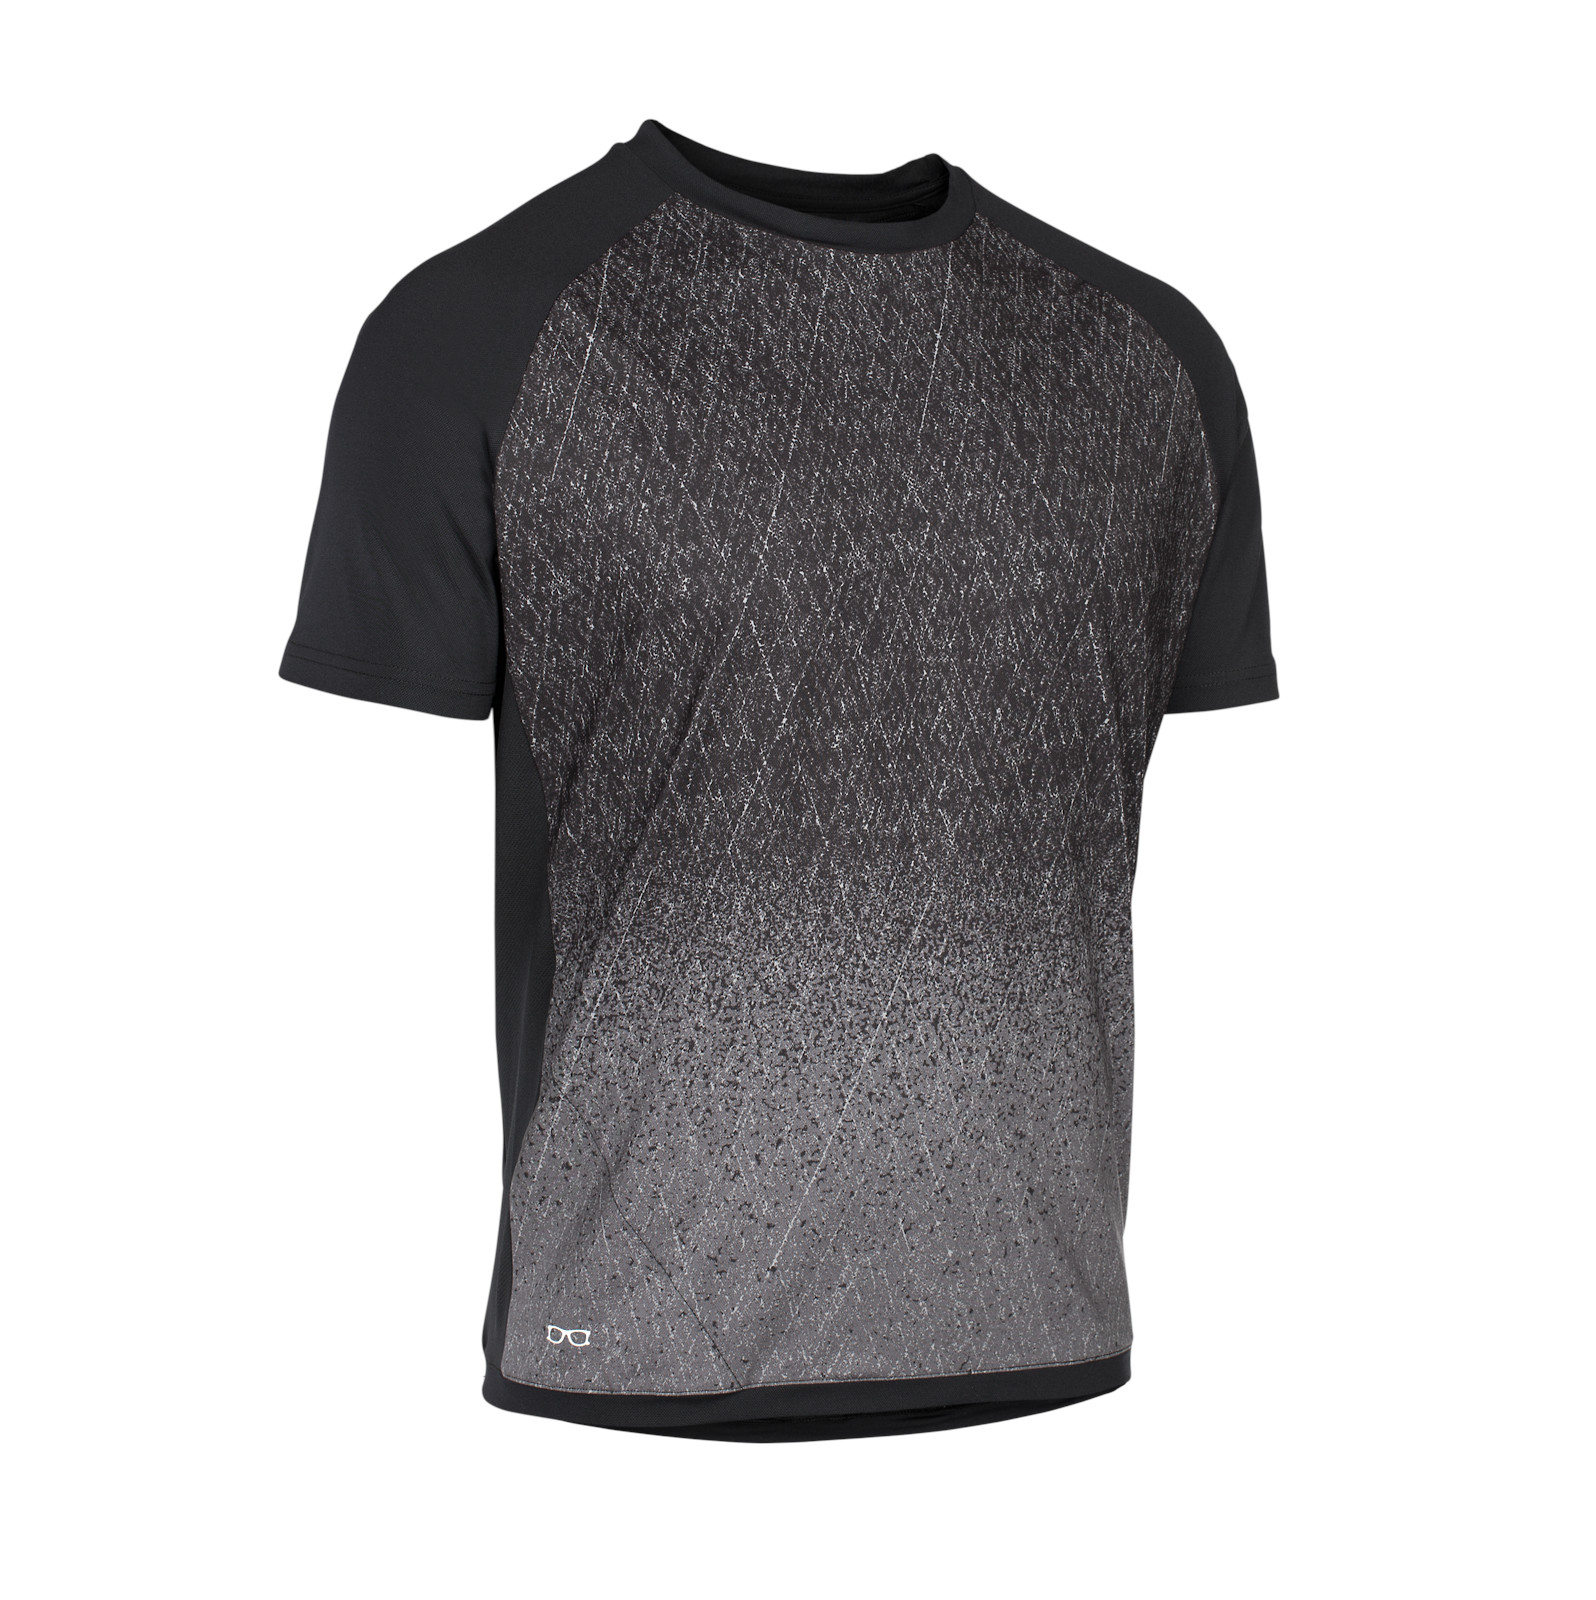 ION Traze Amp Short-Sleeve (black)